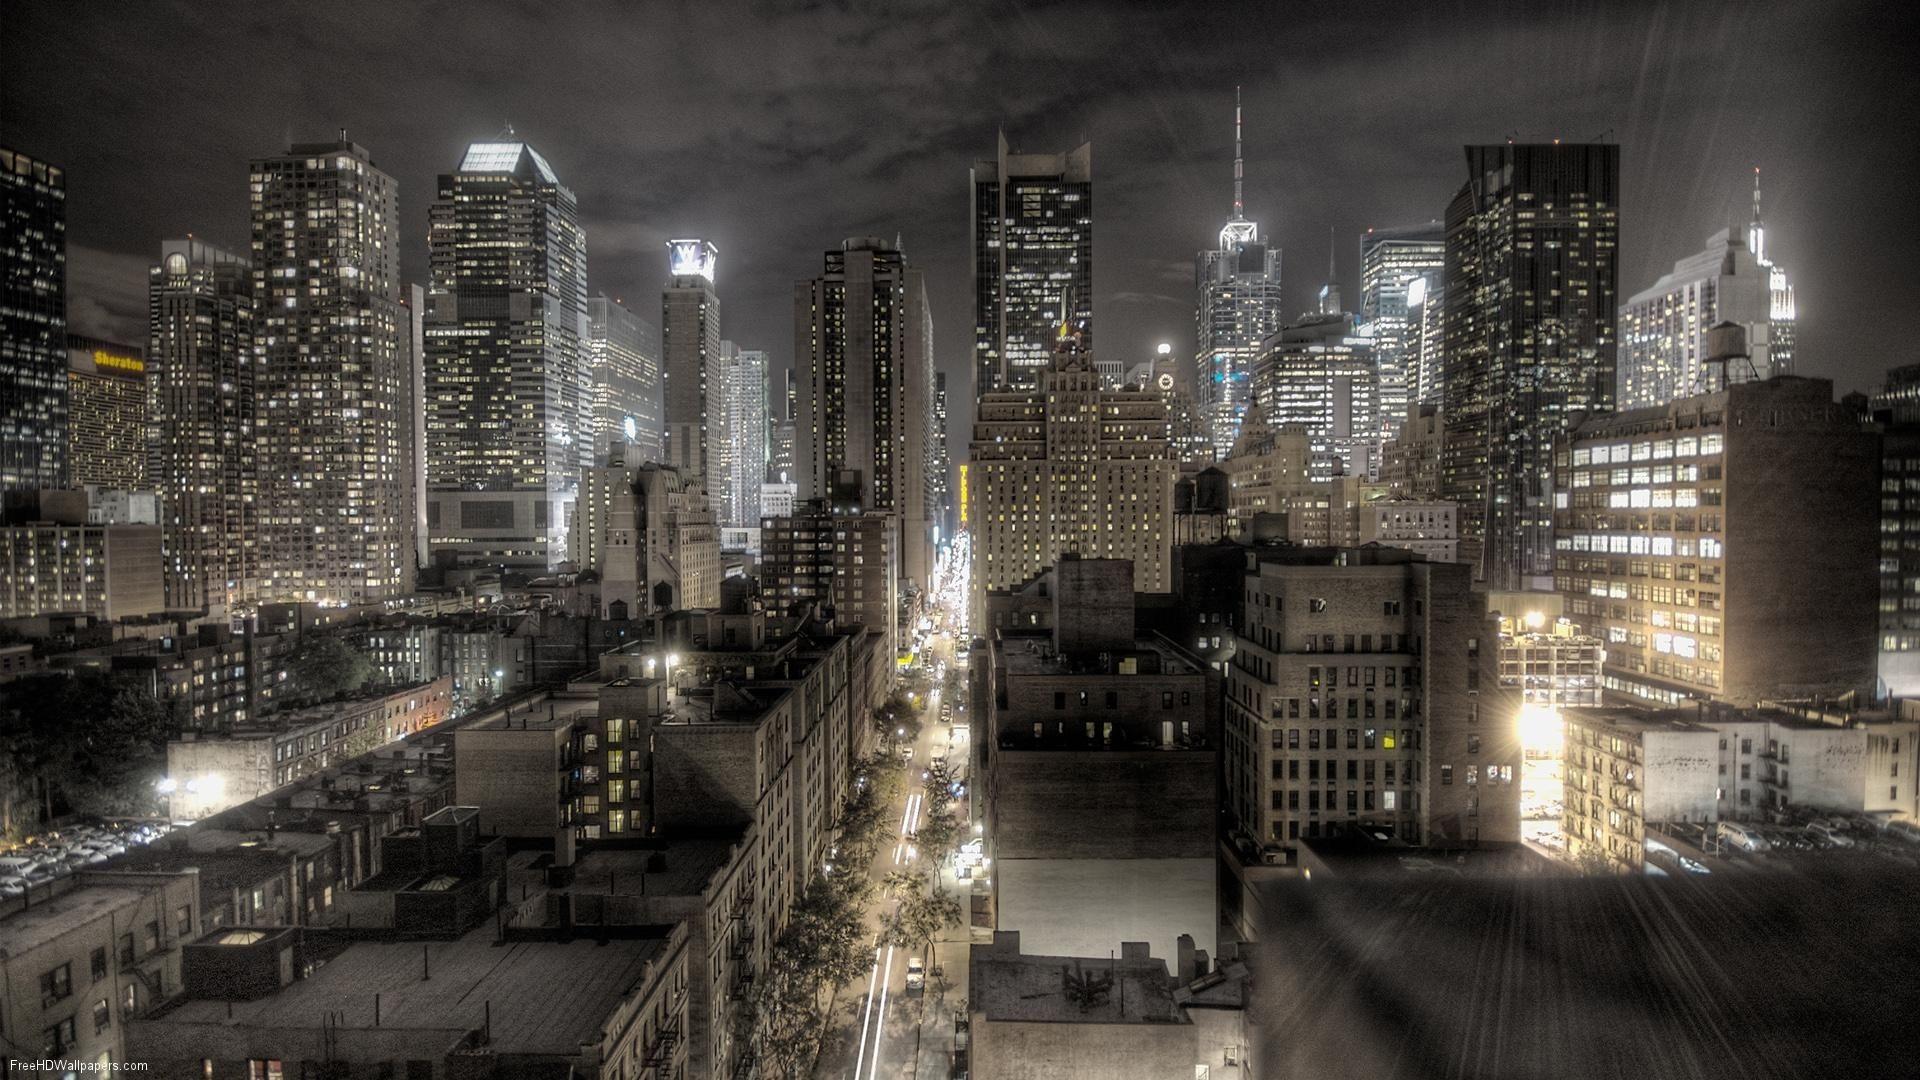 10 New Gotham City Skyline Wallpaper Full Hd 1920 1080 For Pc Background In 2020 Gotham City Skyline City Wallpaper Gotham City